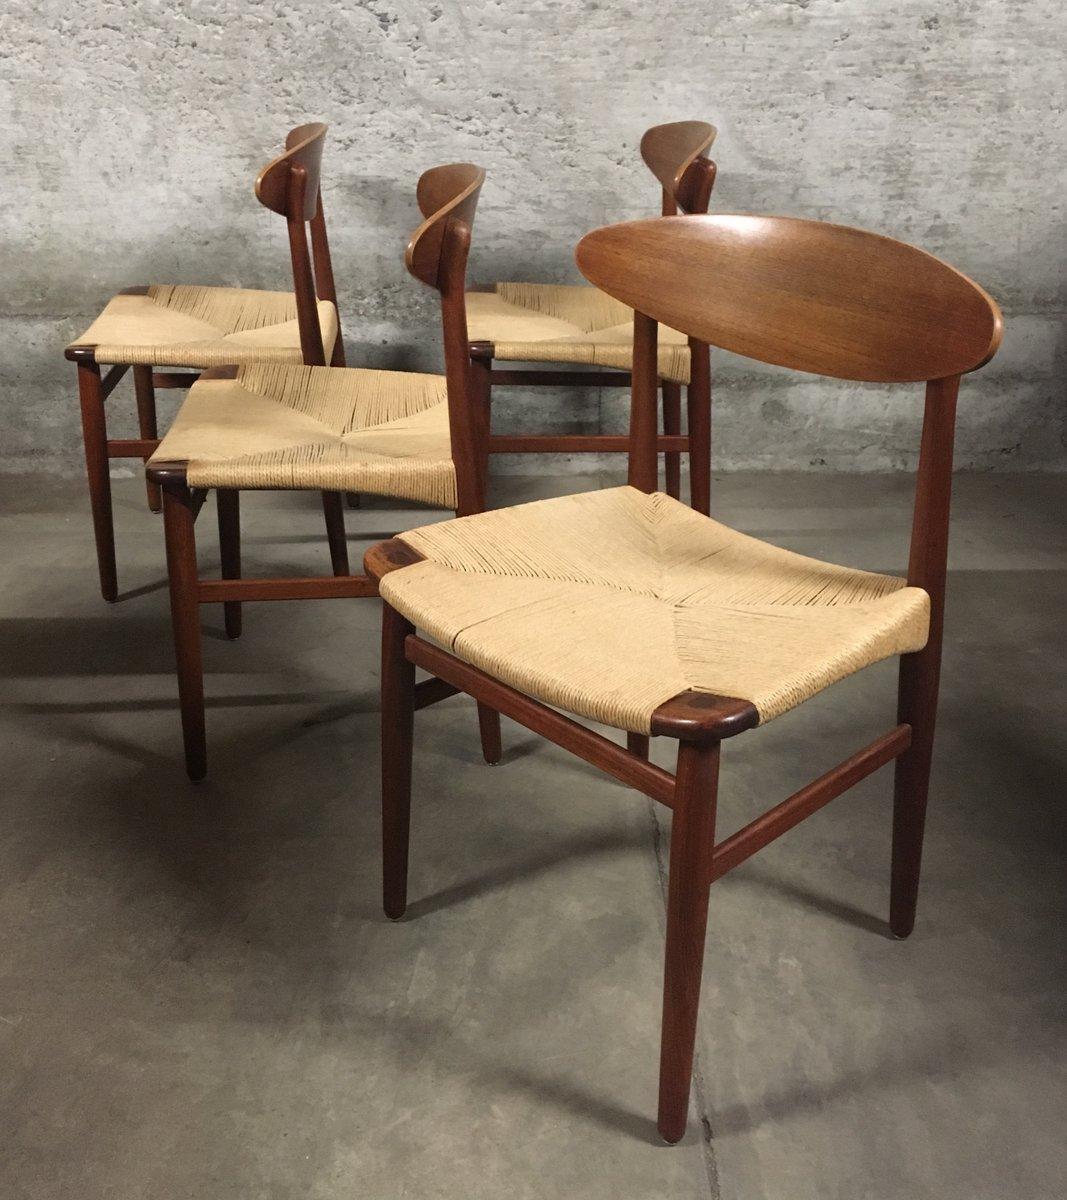 Danish Mid Century Dining Chairs By Børge Mogensen For Søborg Møbelfabrik,  1960s, Set Of 4